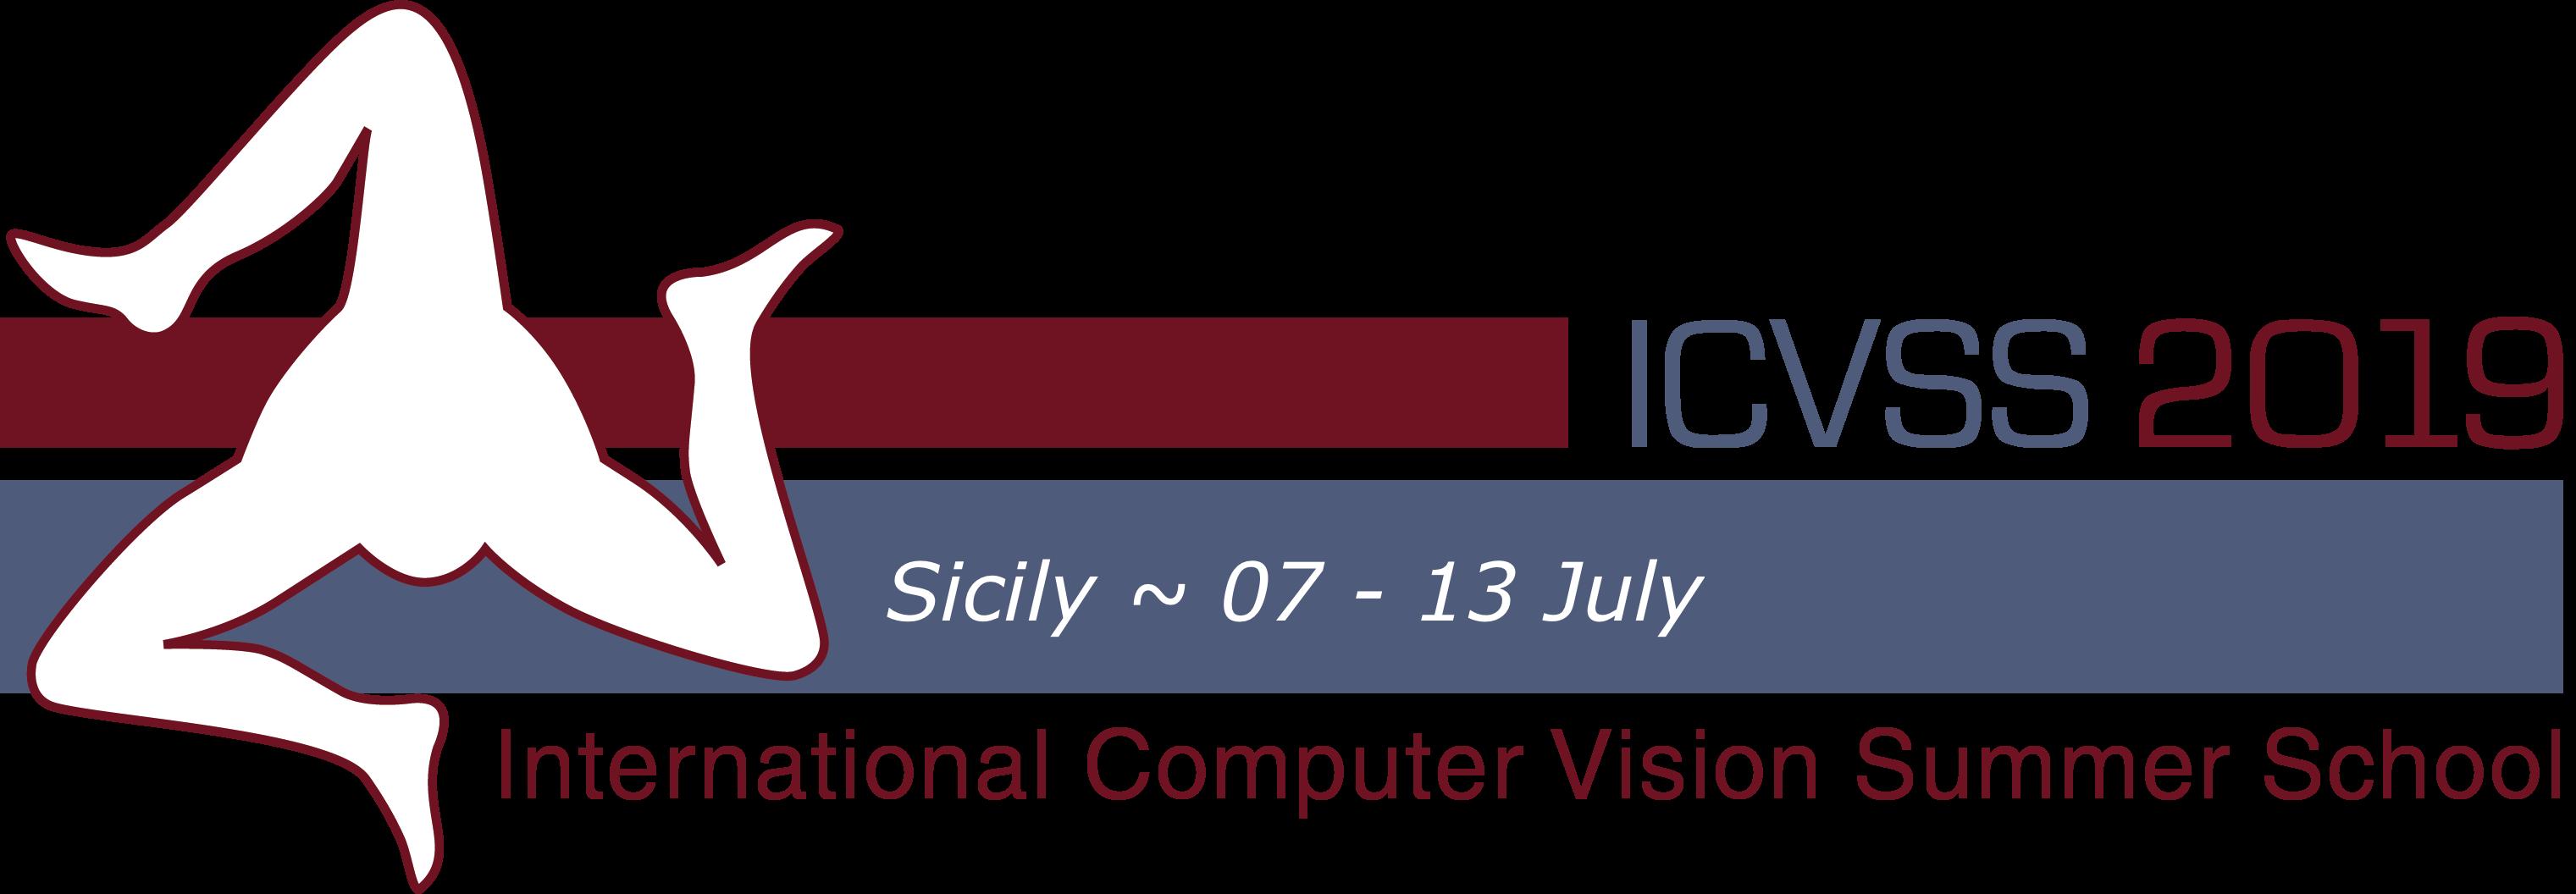 ICVSS 2019 - International Computer Vision Summer School 2019